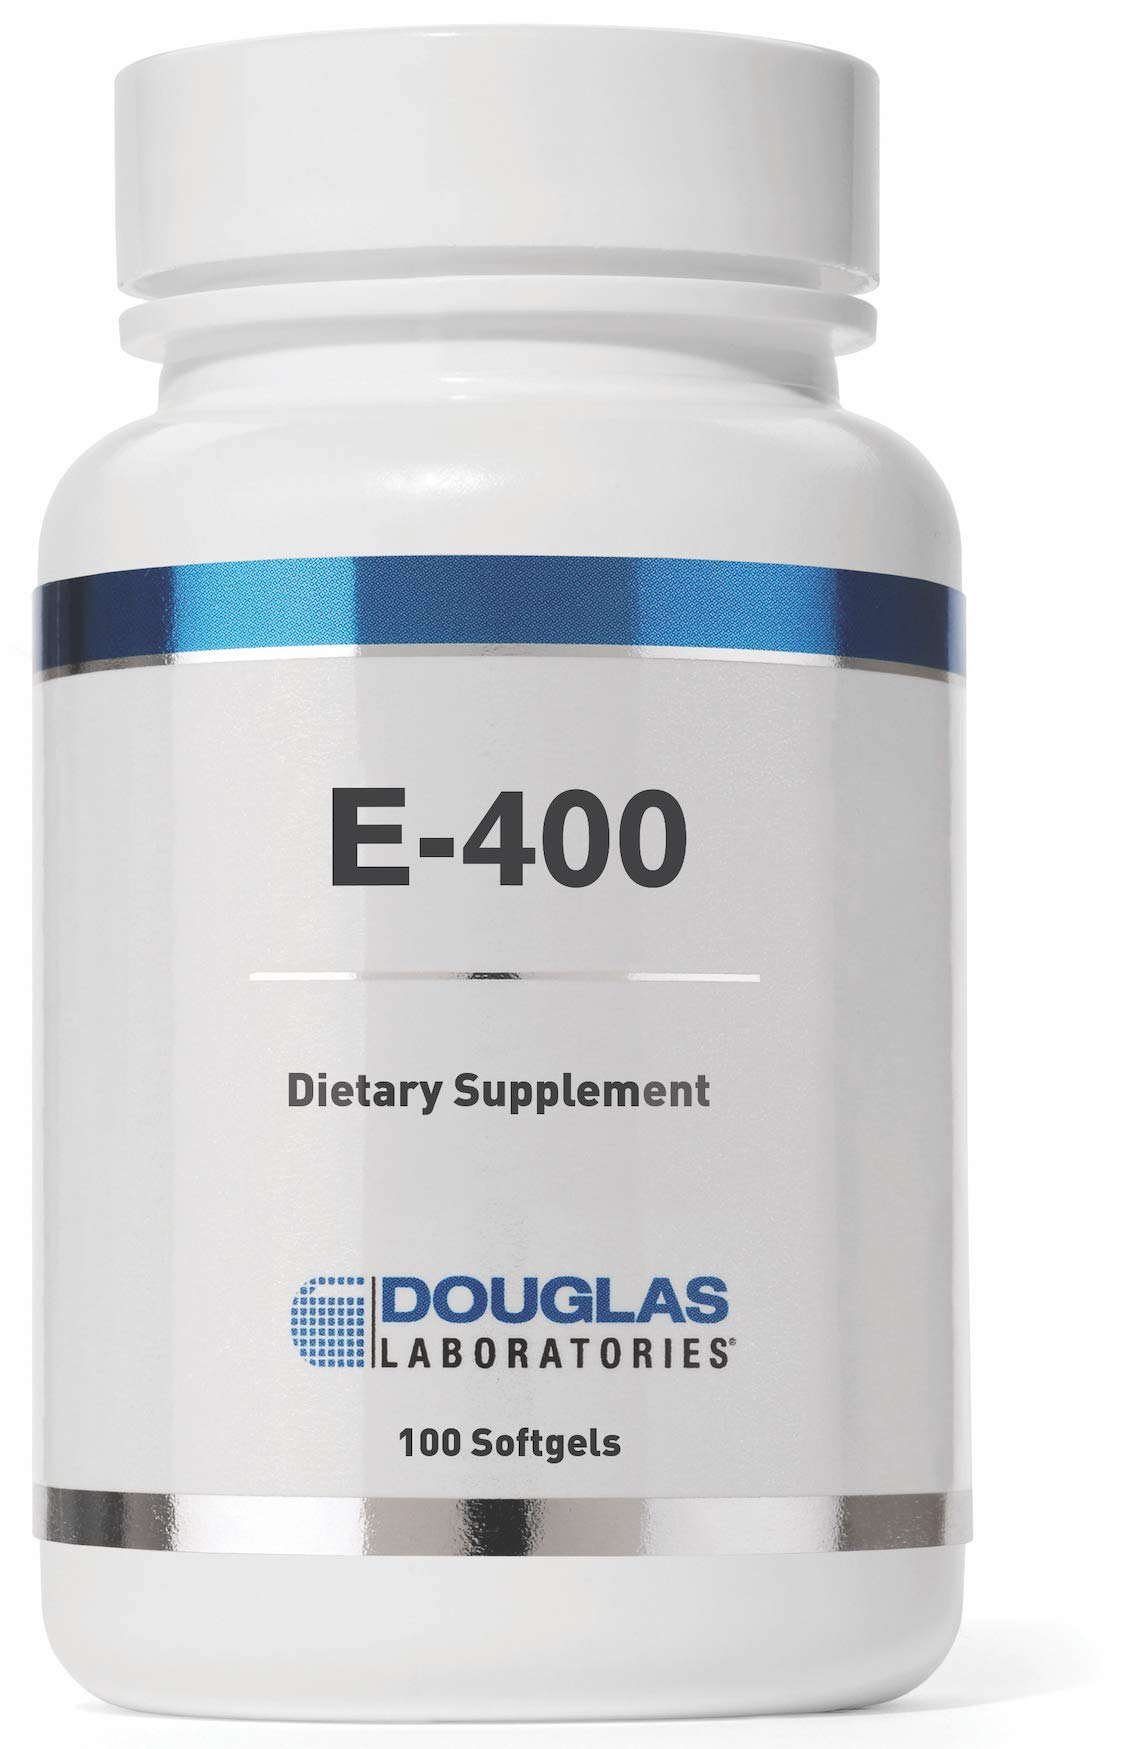 Douglas Laboratories - E-400 - Vitamin E for Antioxidant Protection and Cardiovascular Support - 100 Capsules by Douglas Laboratories